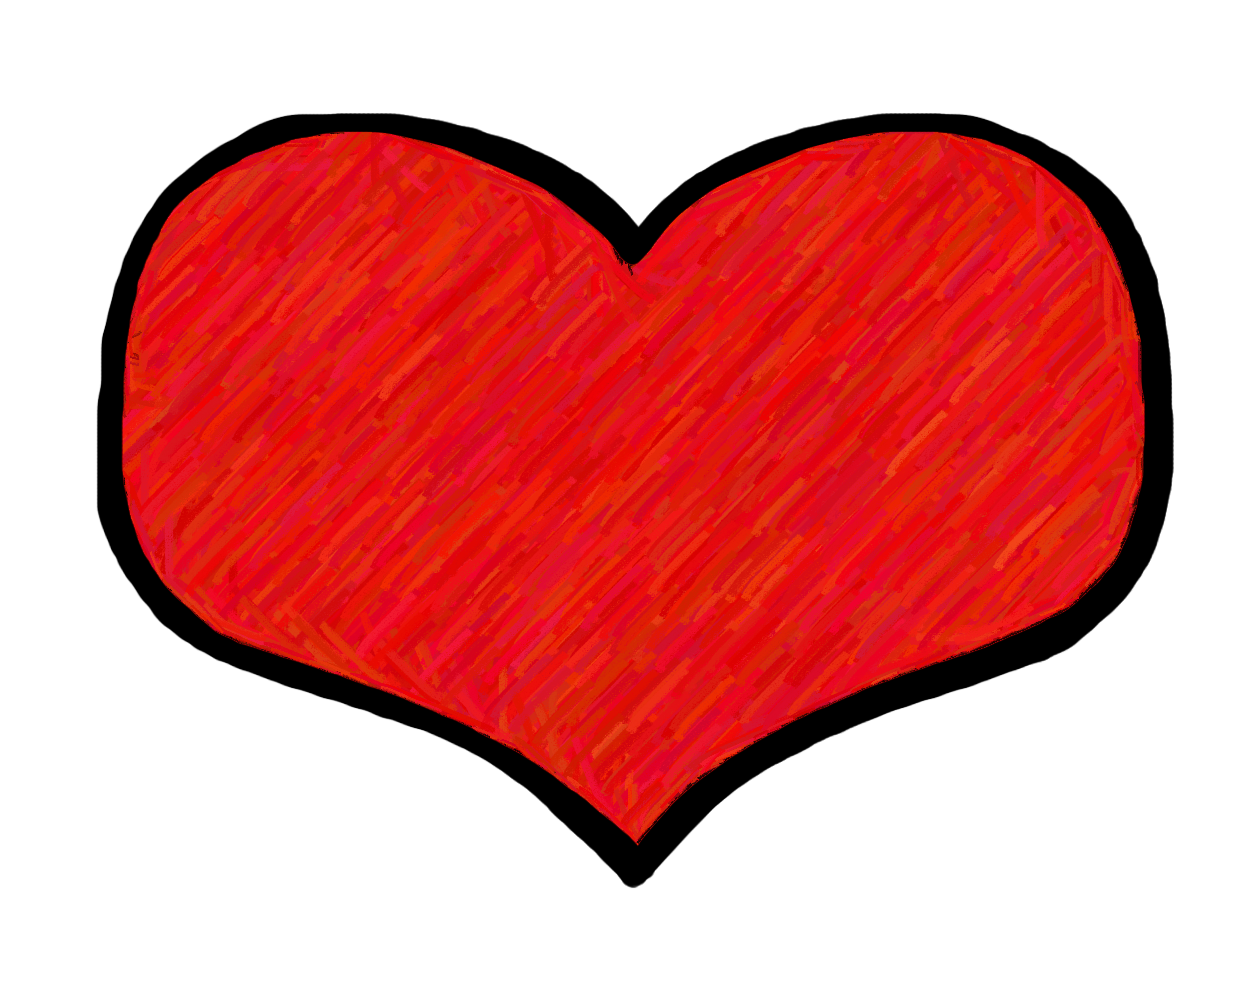 1260x994 Heart Clip Art Cute Image